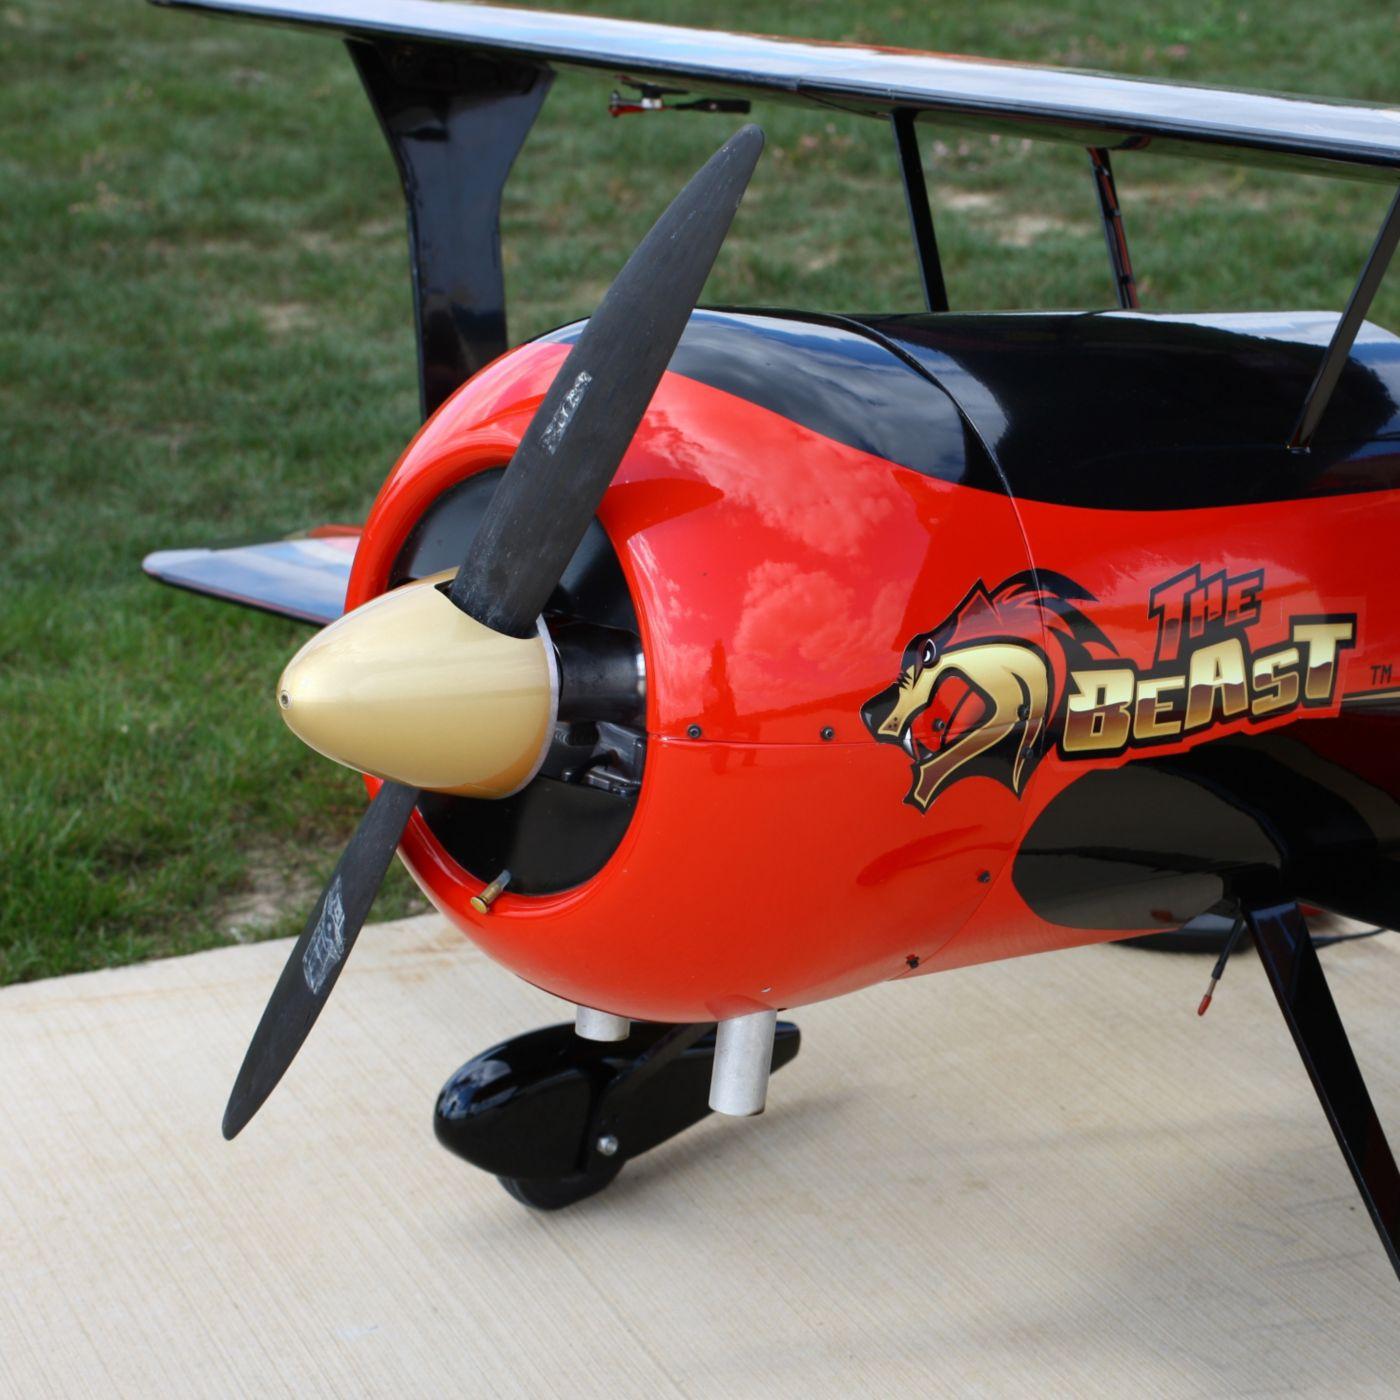 Hangar 9 Beast 100cc Airplane ARF | Horizon Hobby